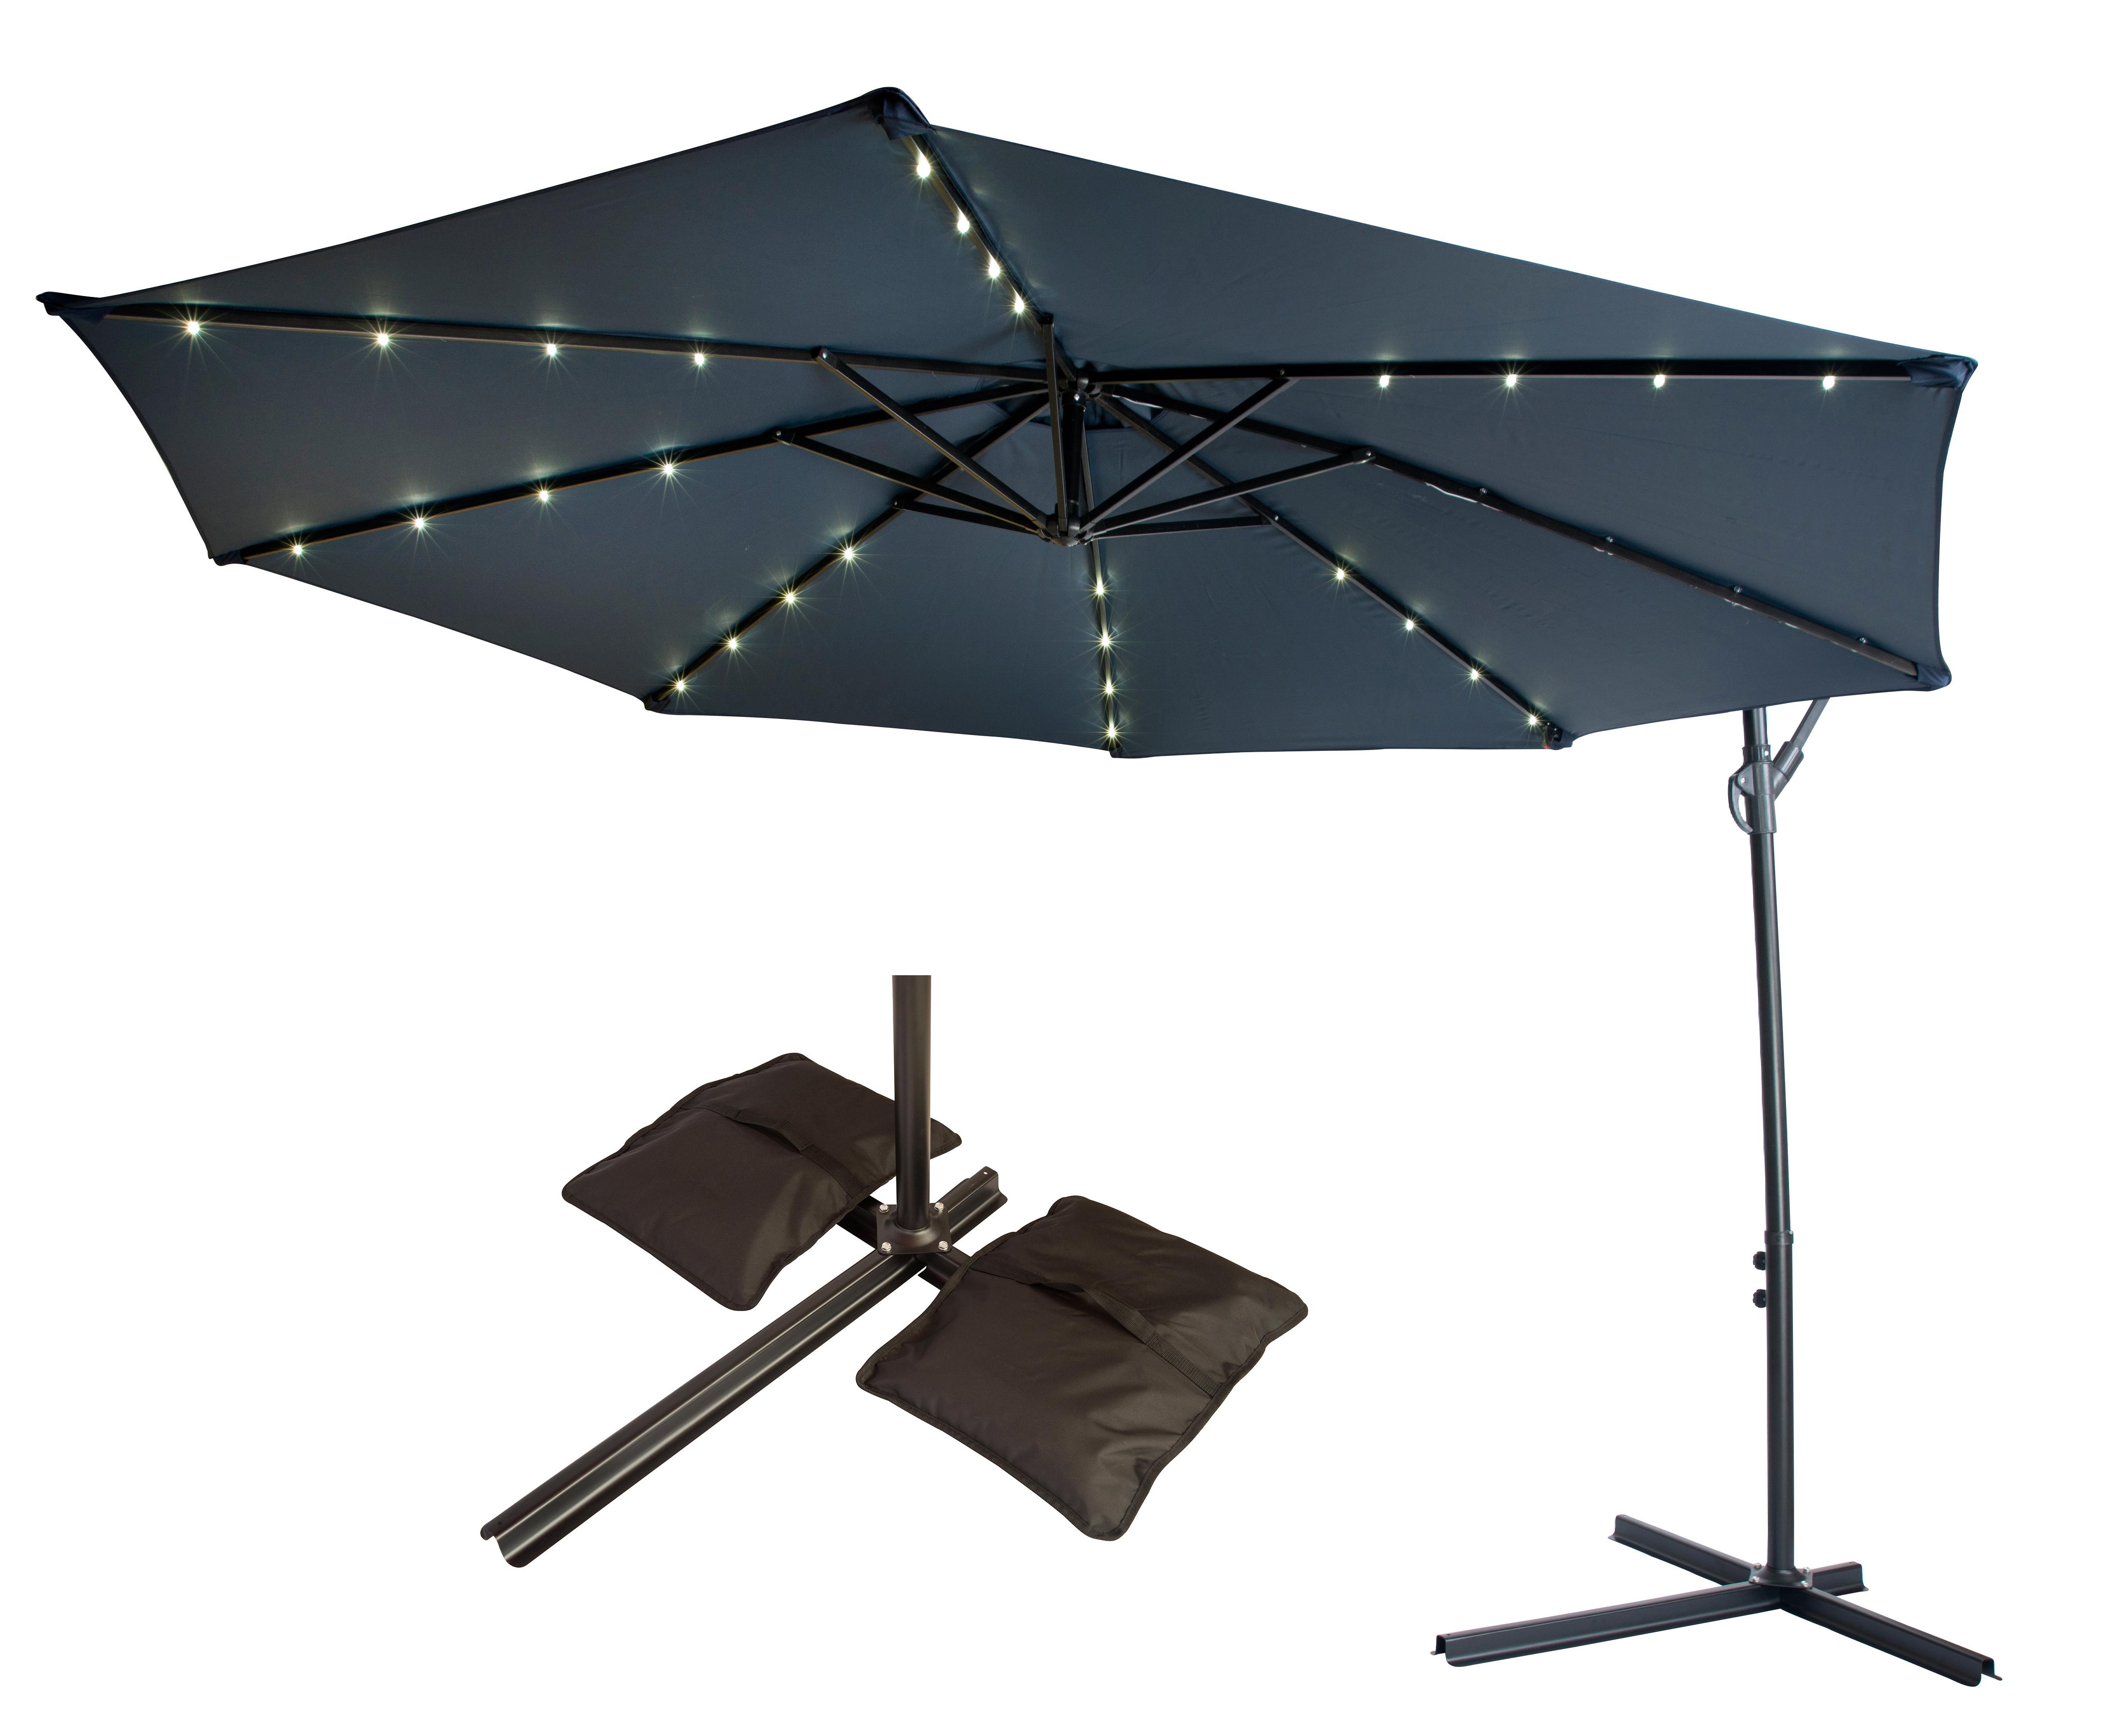 Ryant Cantilever Umbrellas Throughout 2020 10' Cantilever Umbrella (Gallery 16 of 20)